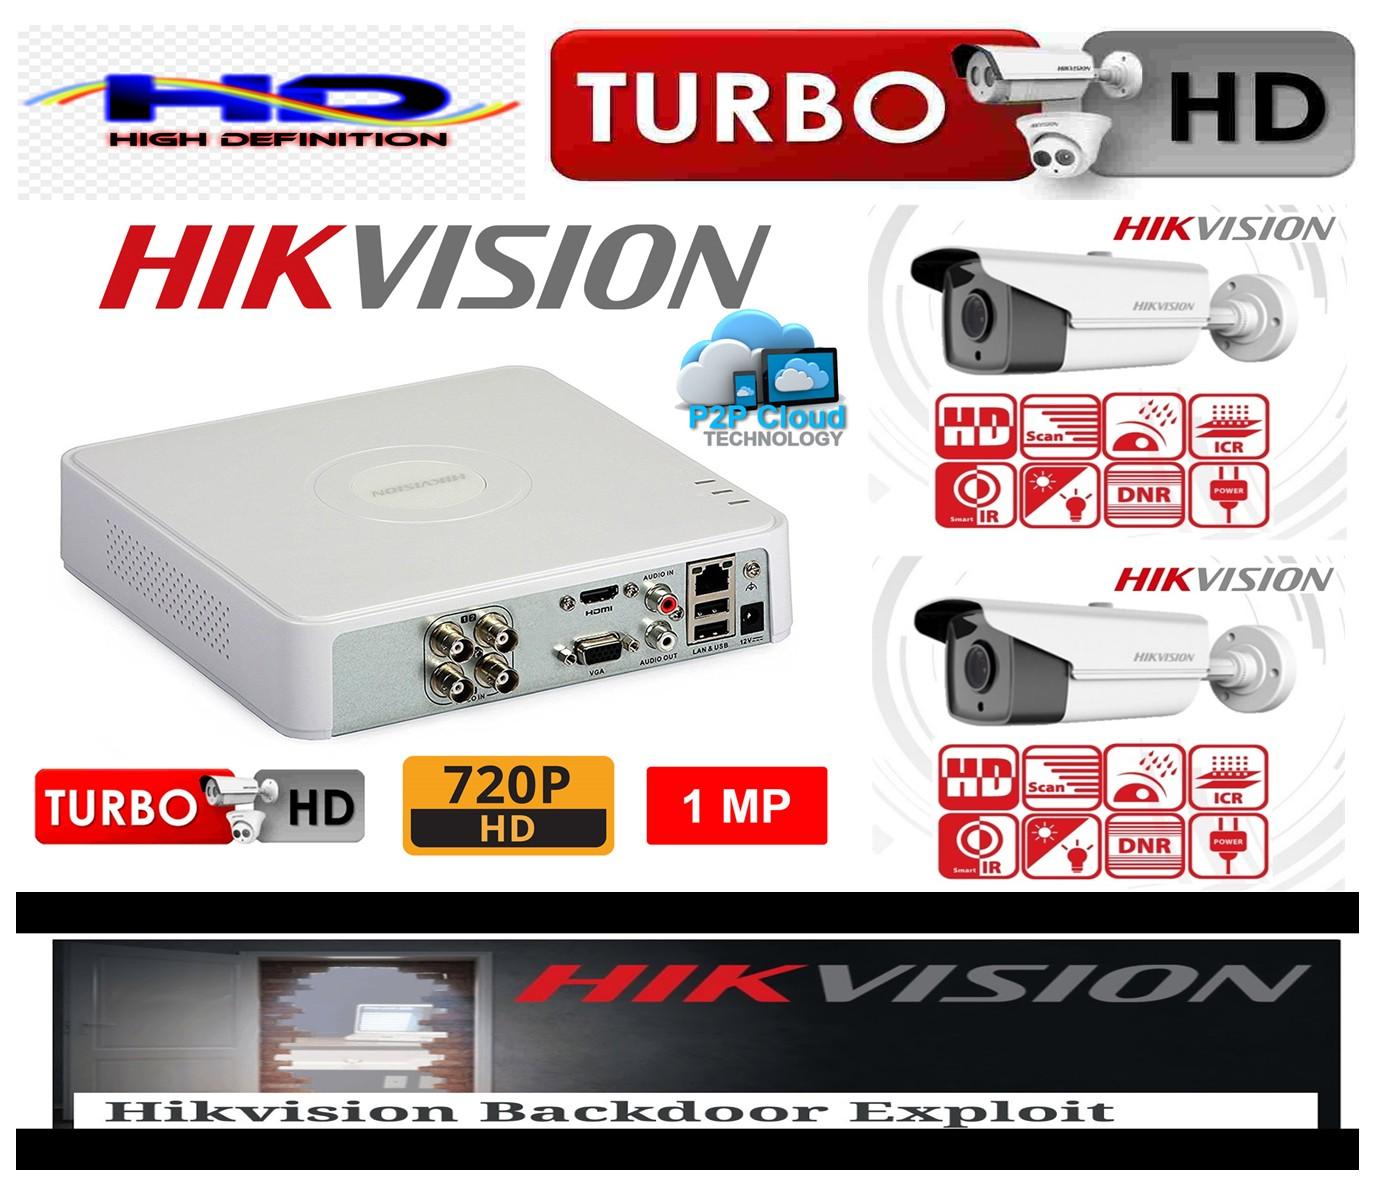 Sistem supraveghere video profesional de exterior 2 camere Hikvision Turbo HD 80m IR si 40m IR, DVR 4 canale